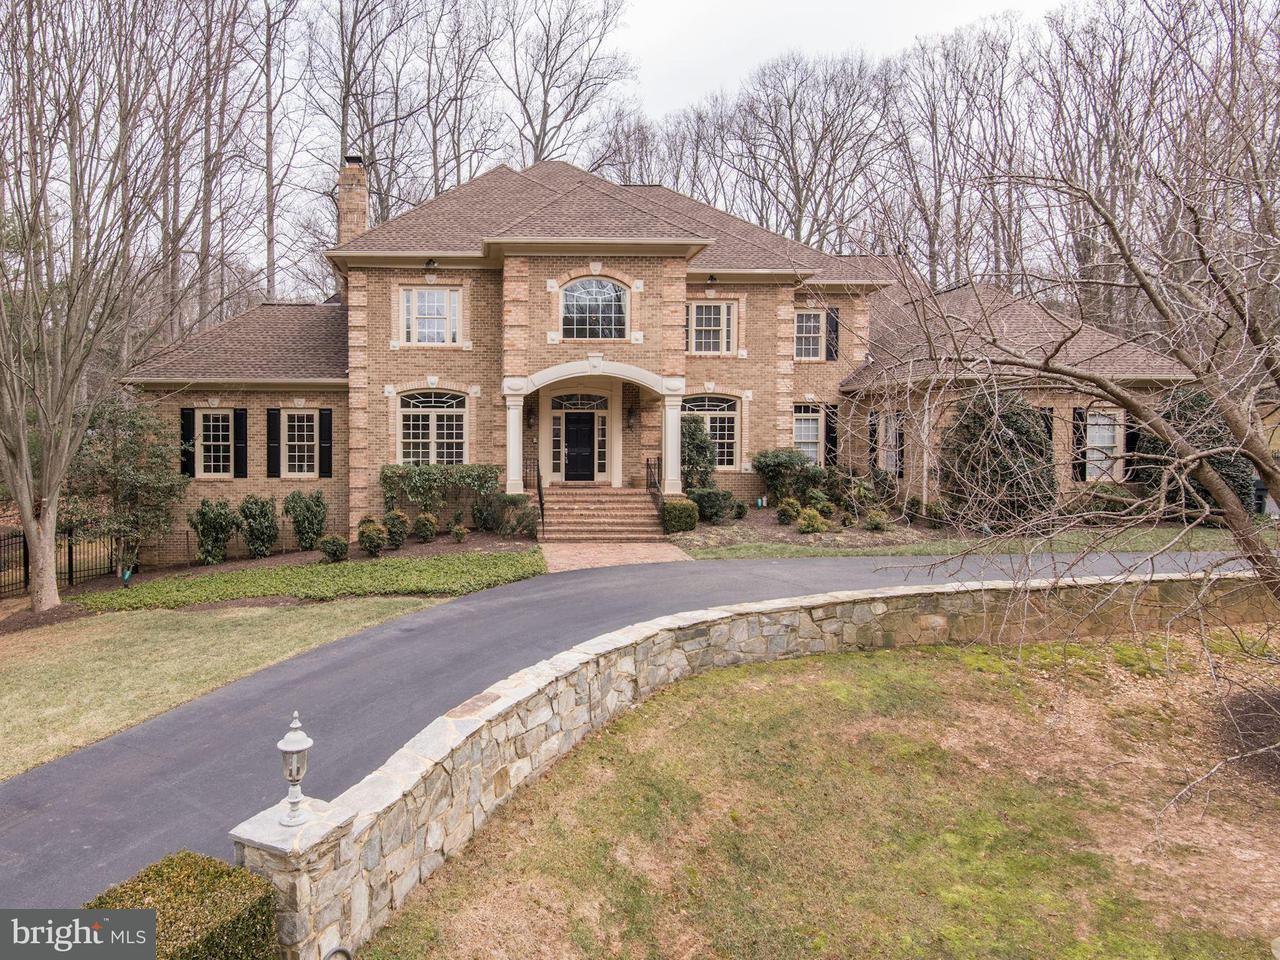 Single Family Home for Sale at 9309 Morison Lane 9309 Morison Lane Great Falls, Virginia 22066 United States